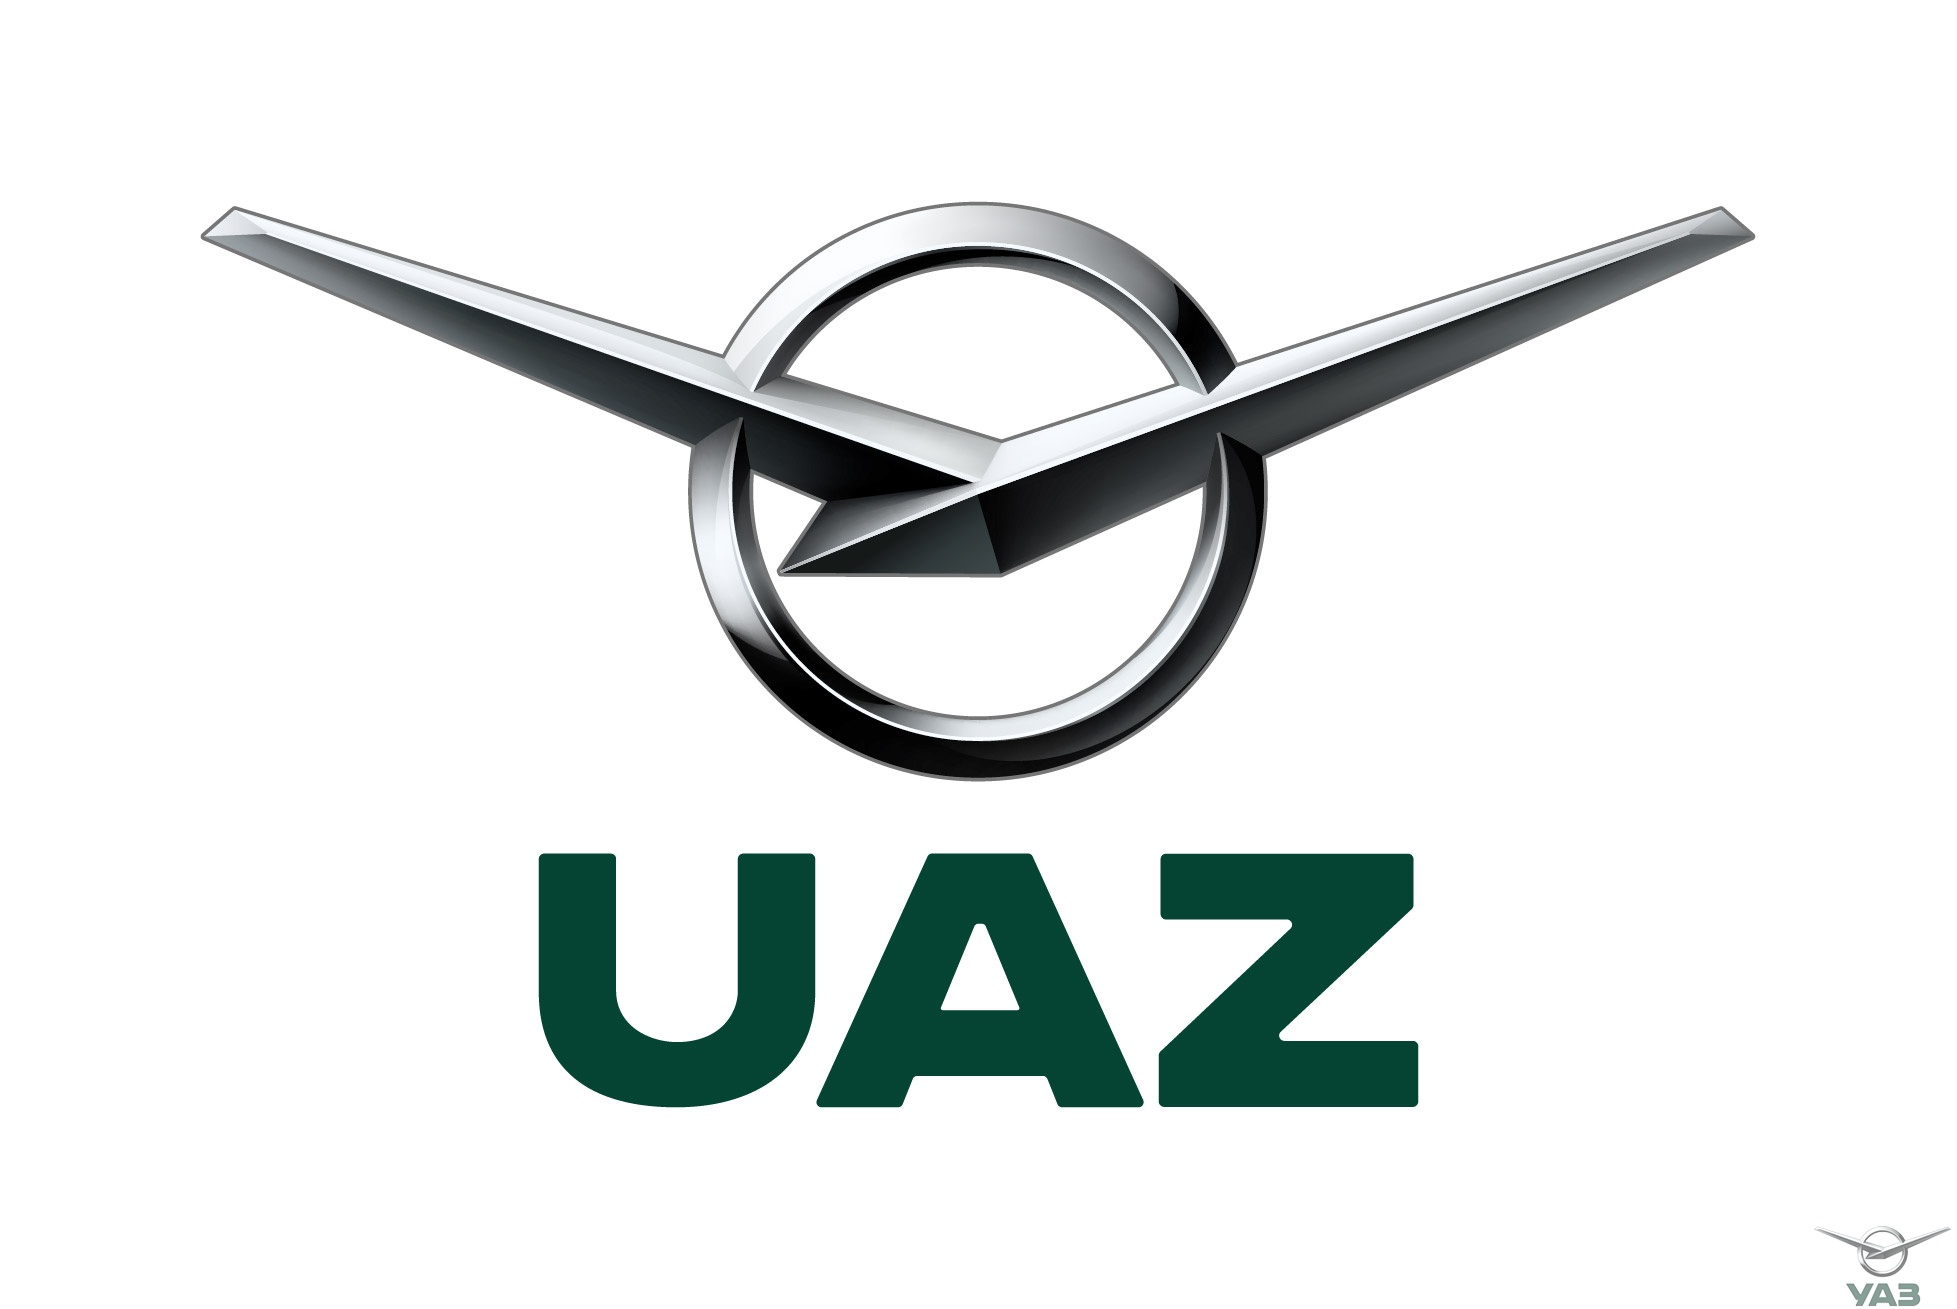 uaz_uaz